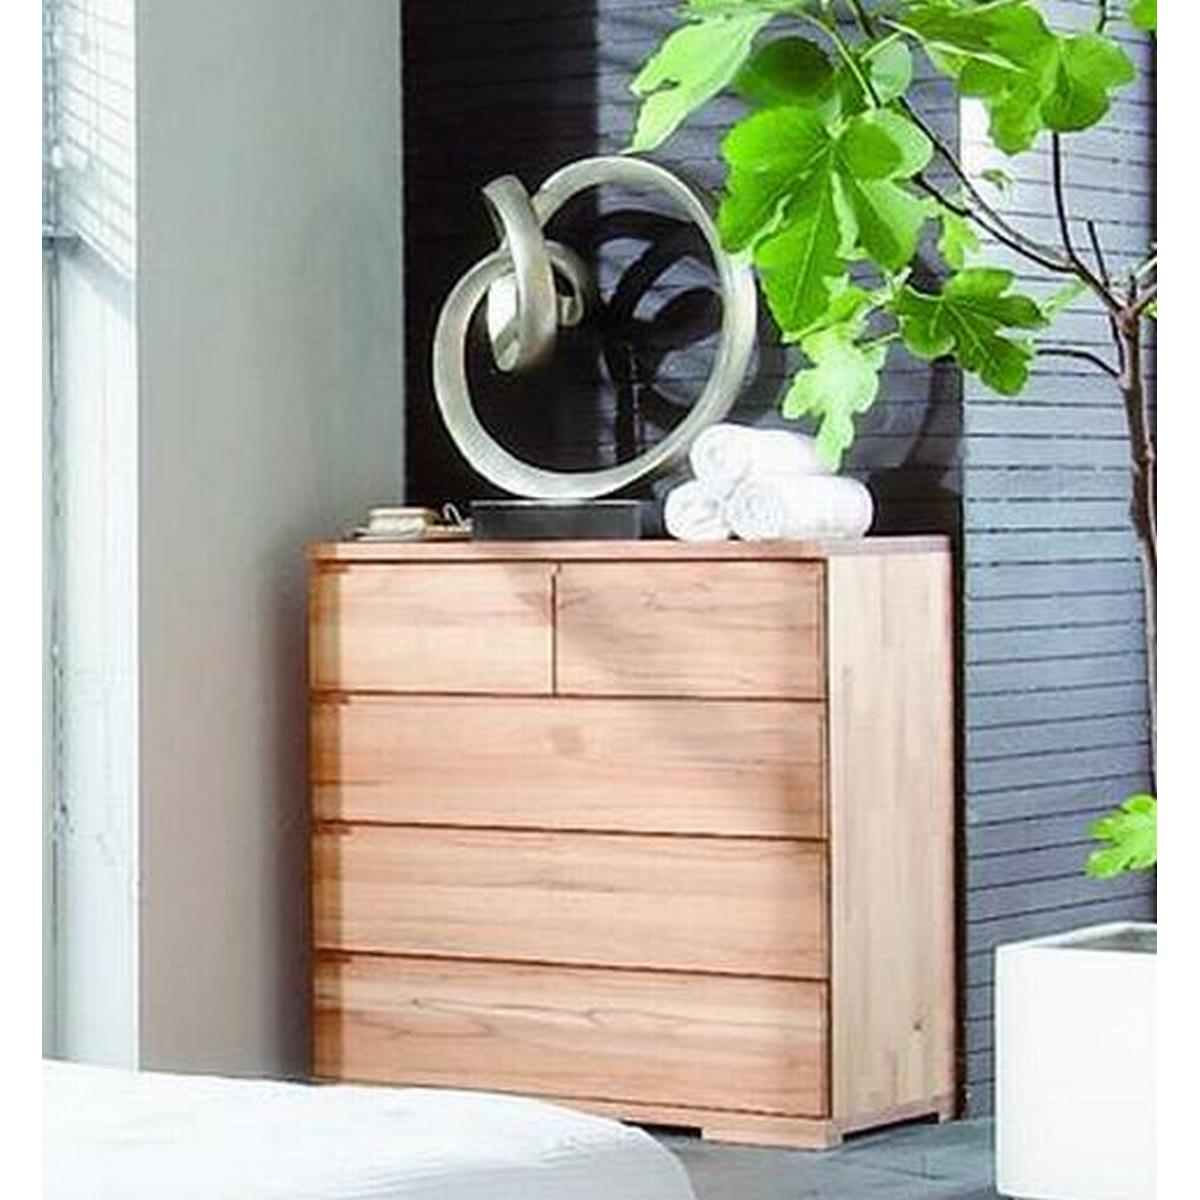 schlafzimmer kommode schubladenkommode b holz kernbuche. Black Bedroom Furniture Sets. Home Design Ideas